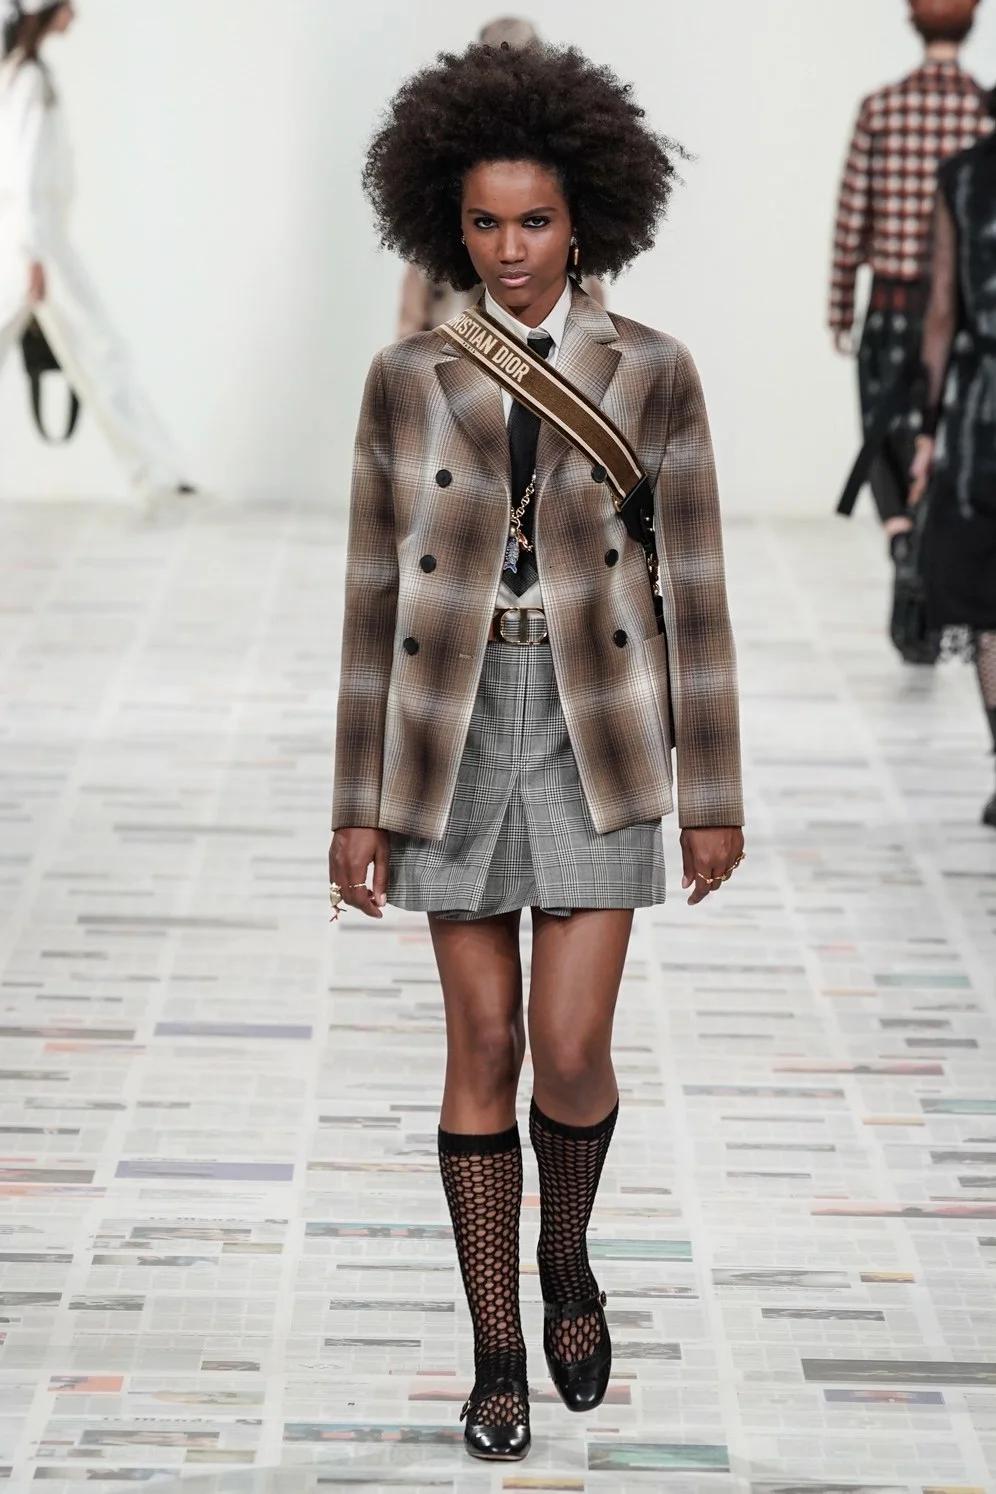 Christian Dior Herbst/Winter 20202021 ReadytoWear